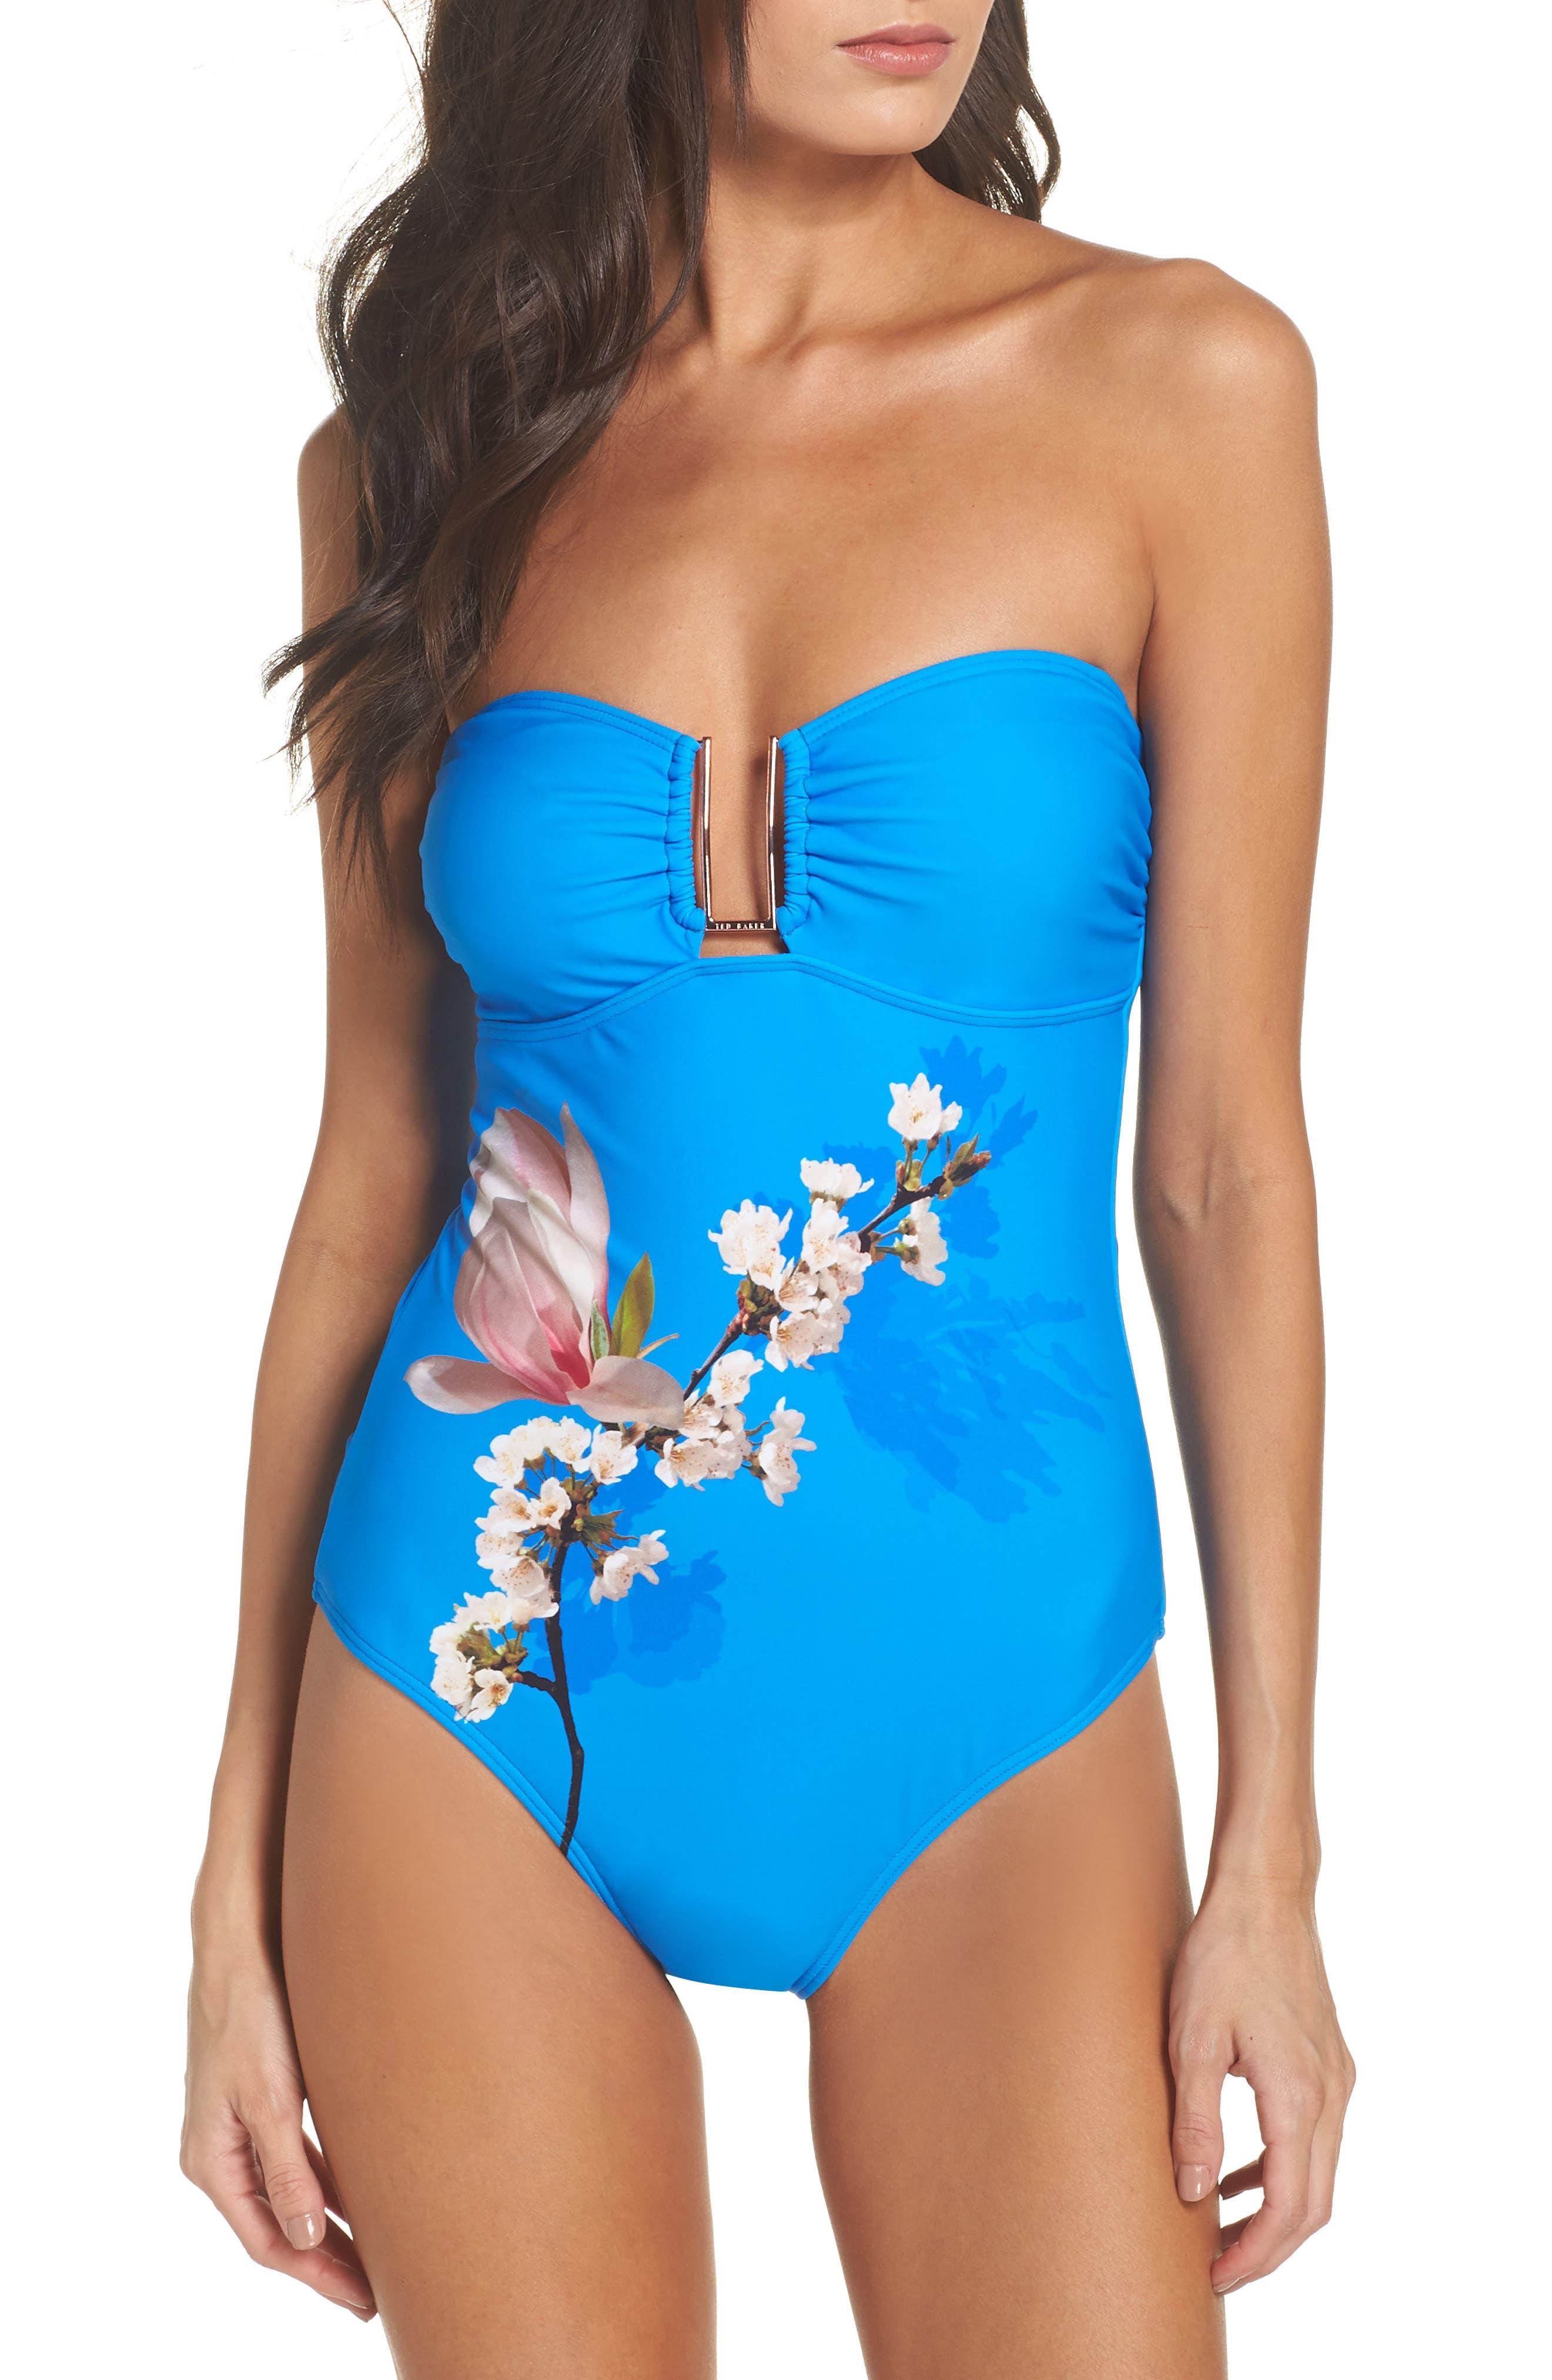 Harmony Bandeau One-Piece Swimsuit,                             Main thumbnail 1, color,                             Bright Blue